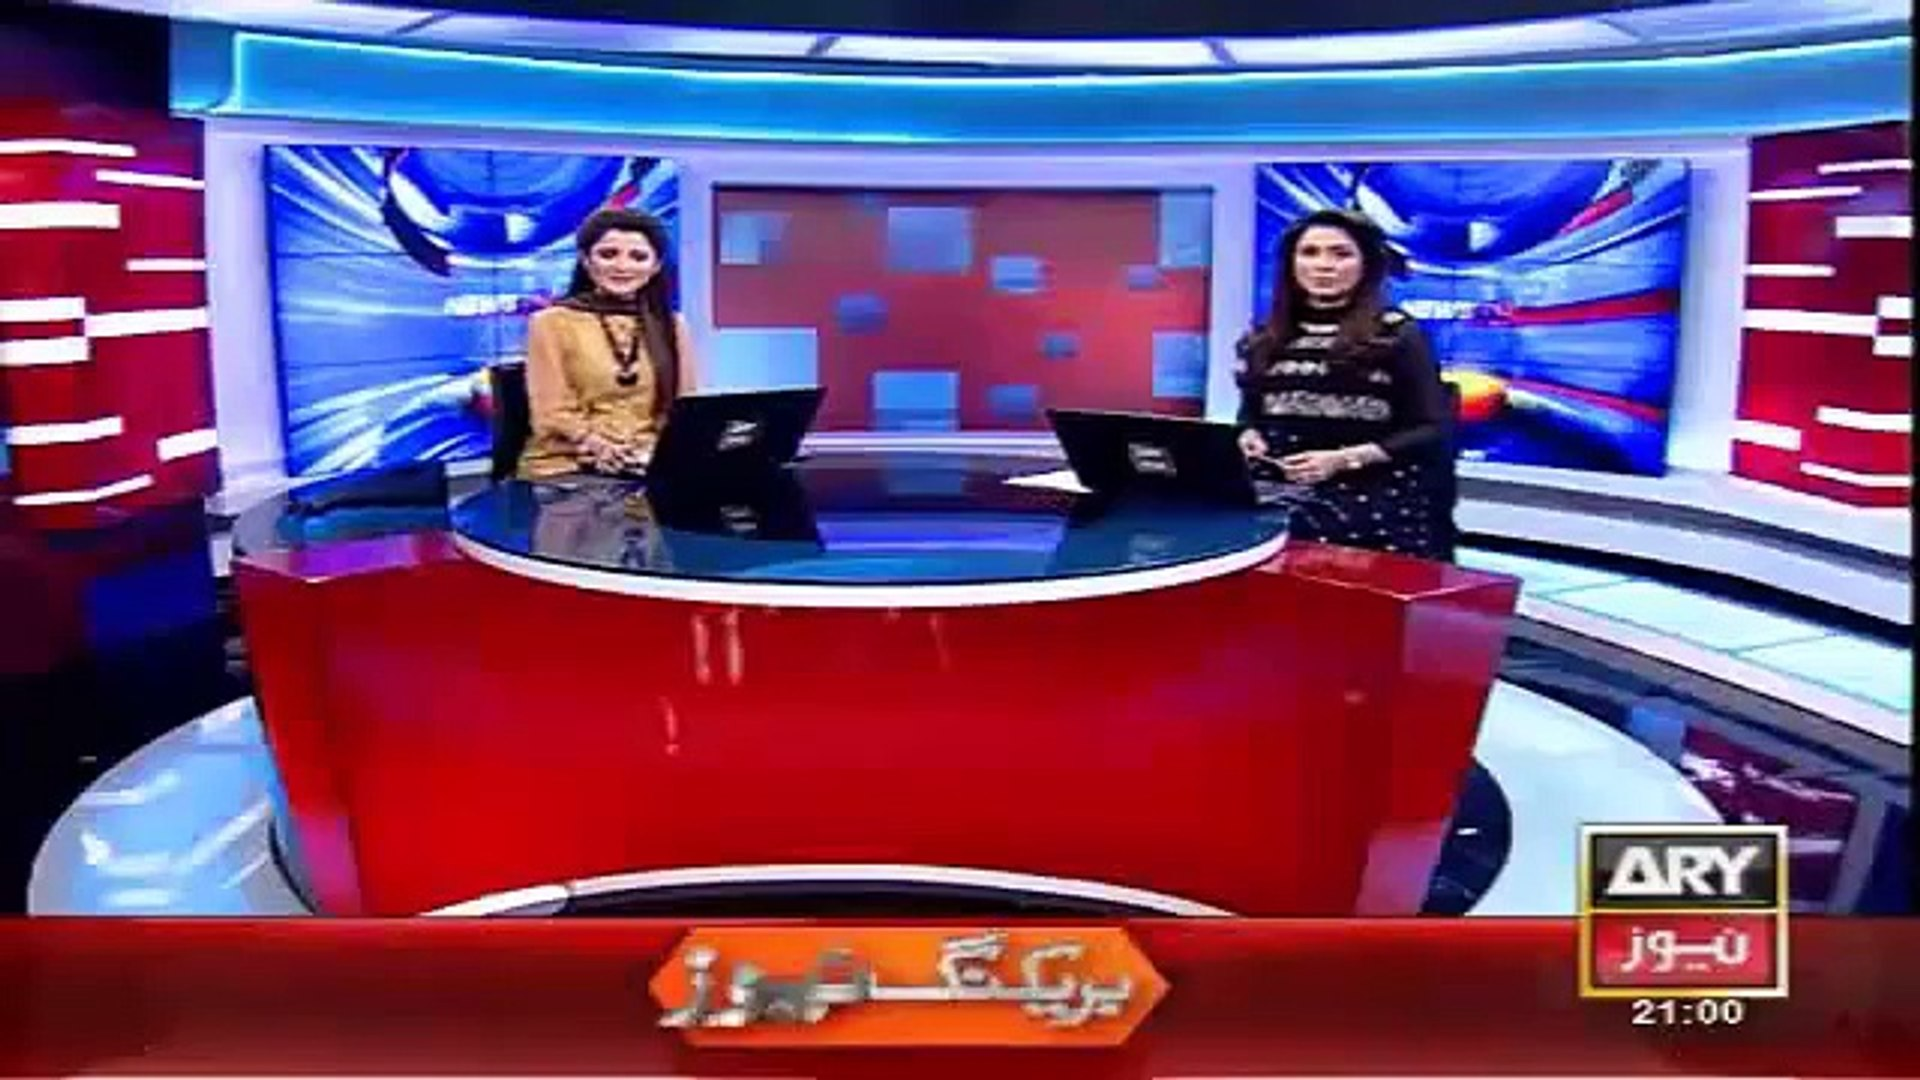 The News - Ary News Headlines - 18 March 2016 - 2100 - Pakistan News -  Latest News